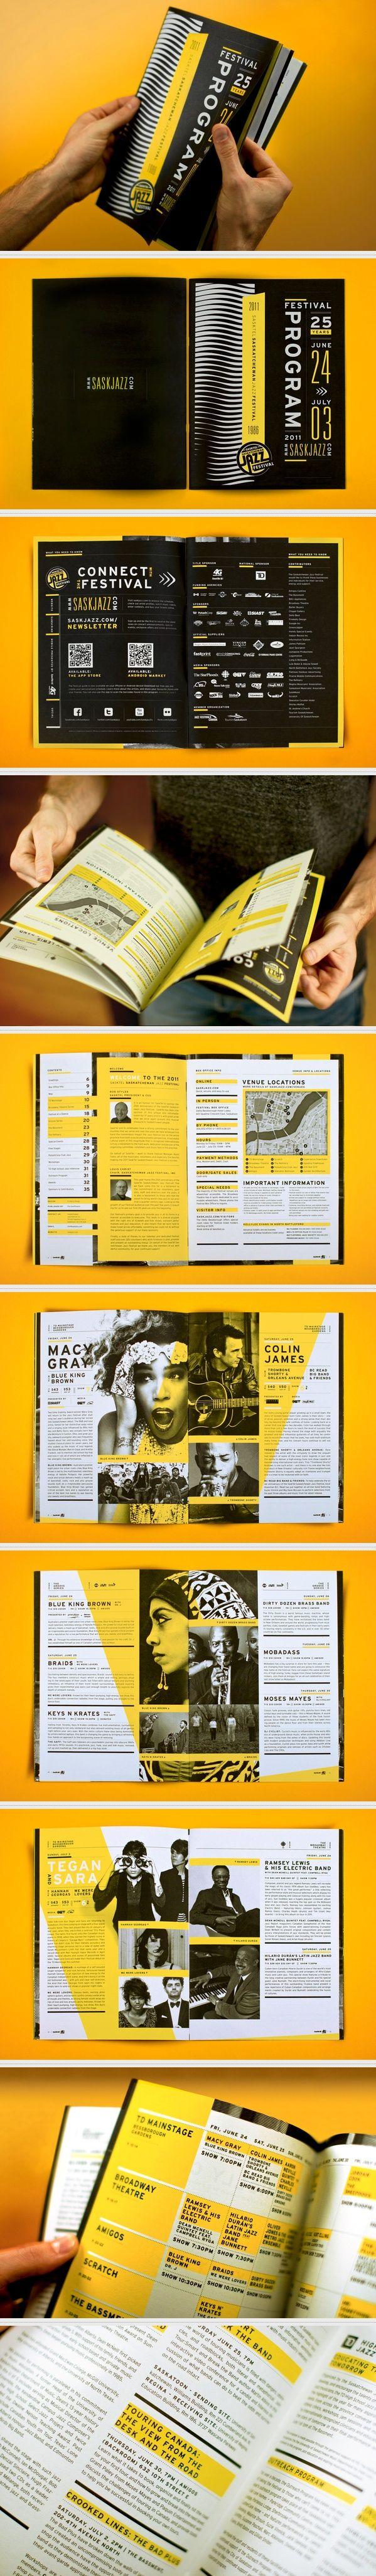 Programma ⊳ magazine design